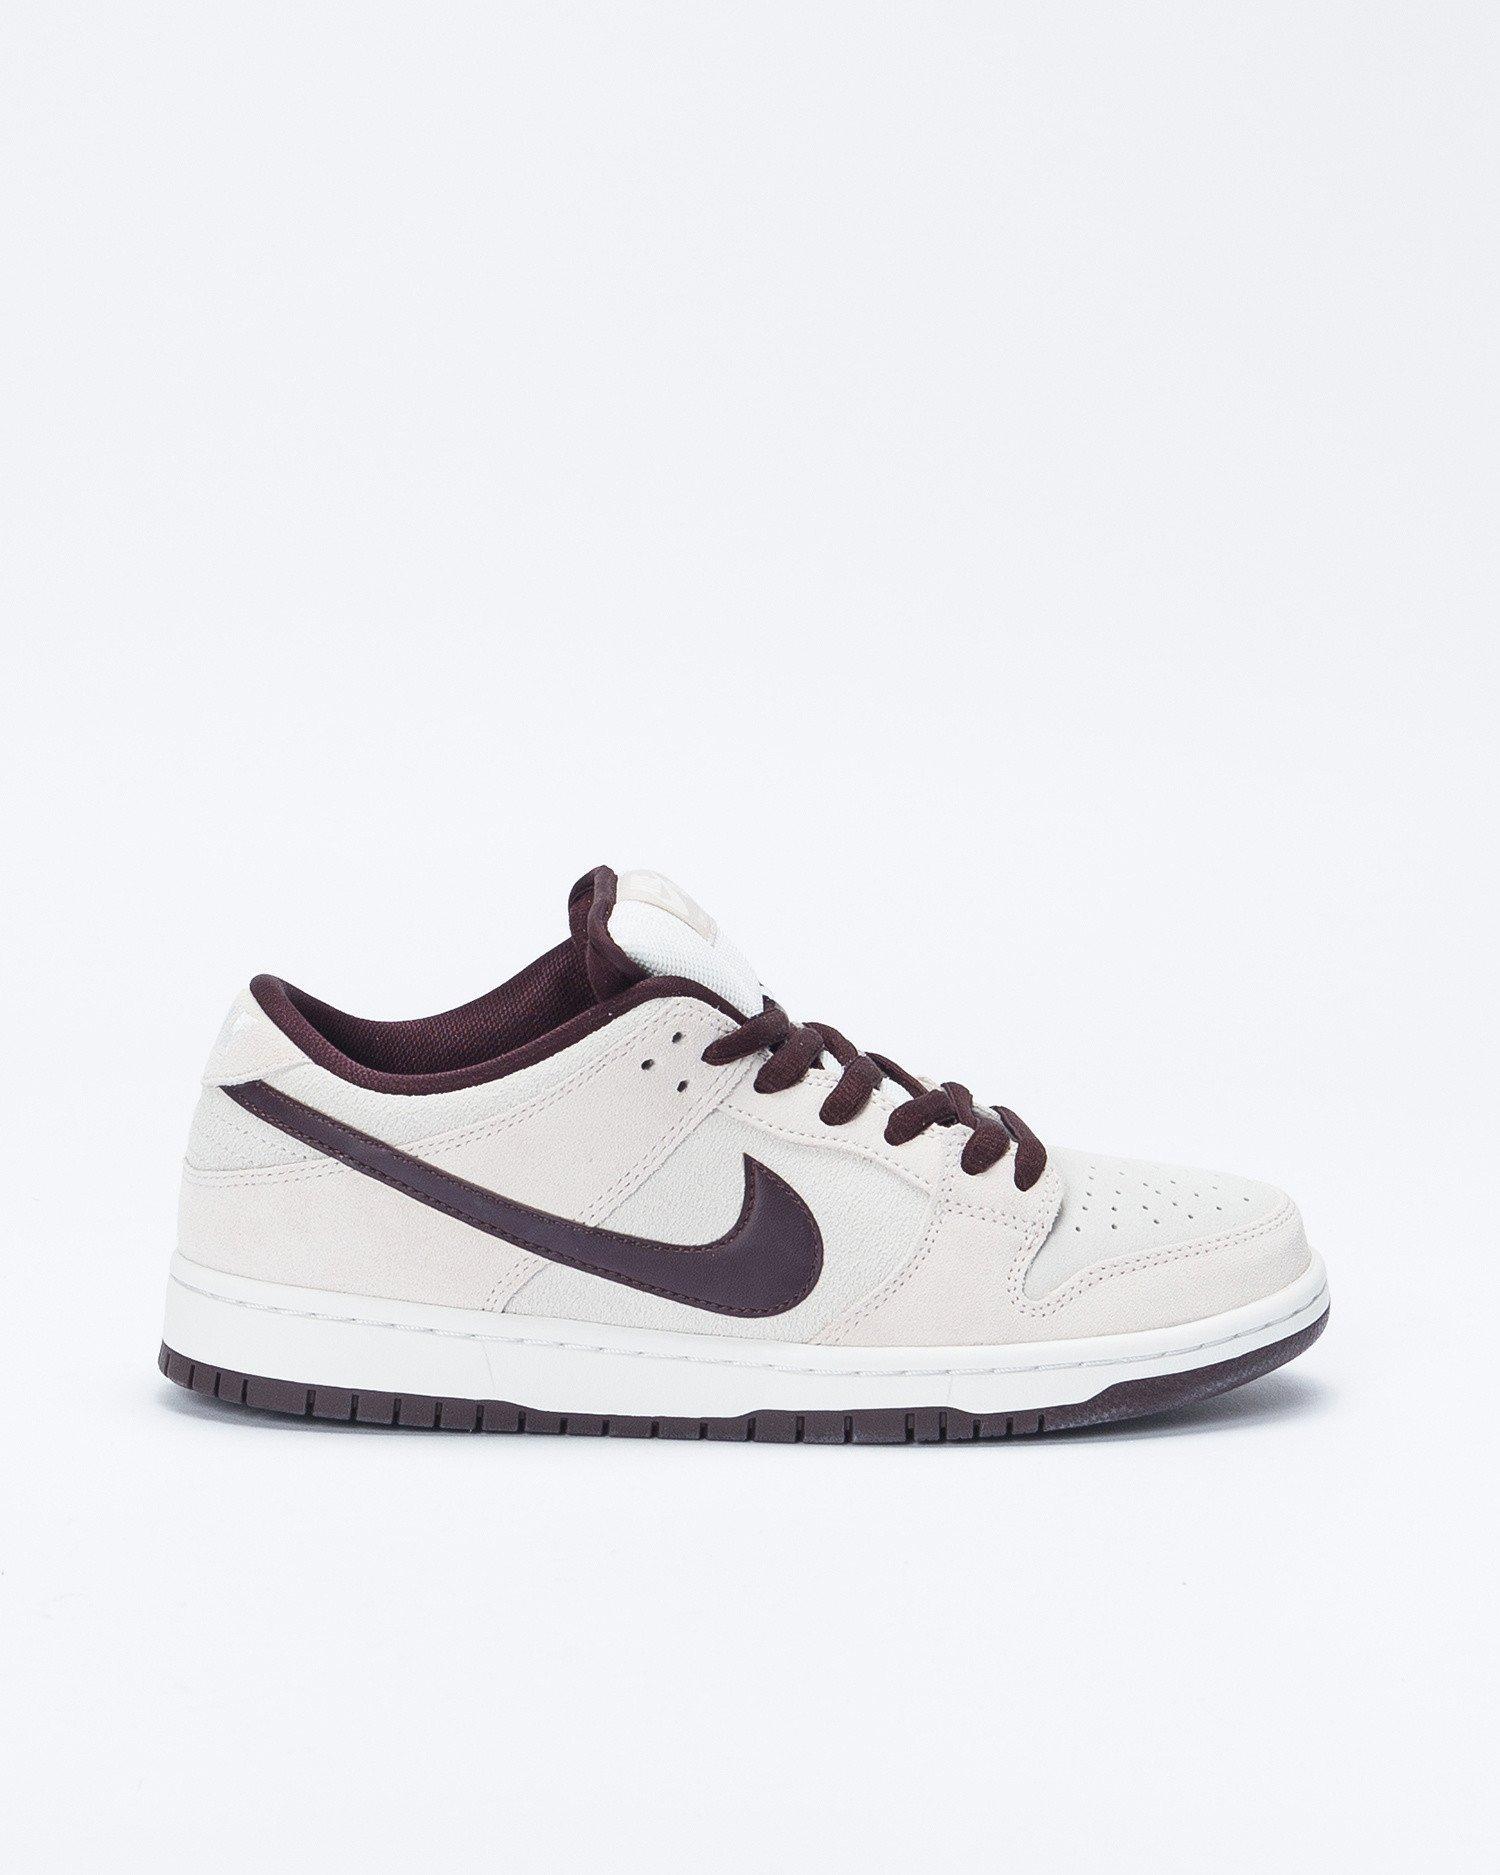 best service 3fe93 463be Nike SB Nike SB Dunk Low Pro Desert Sand/Mahogany-Summit White